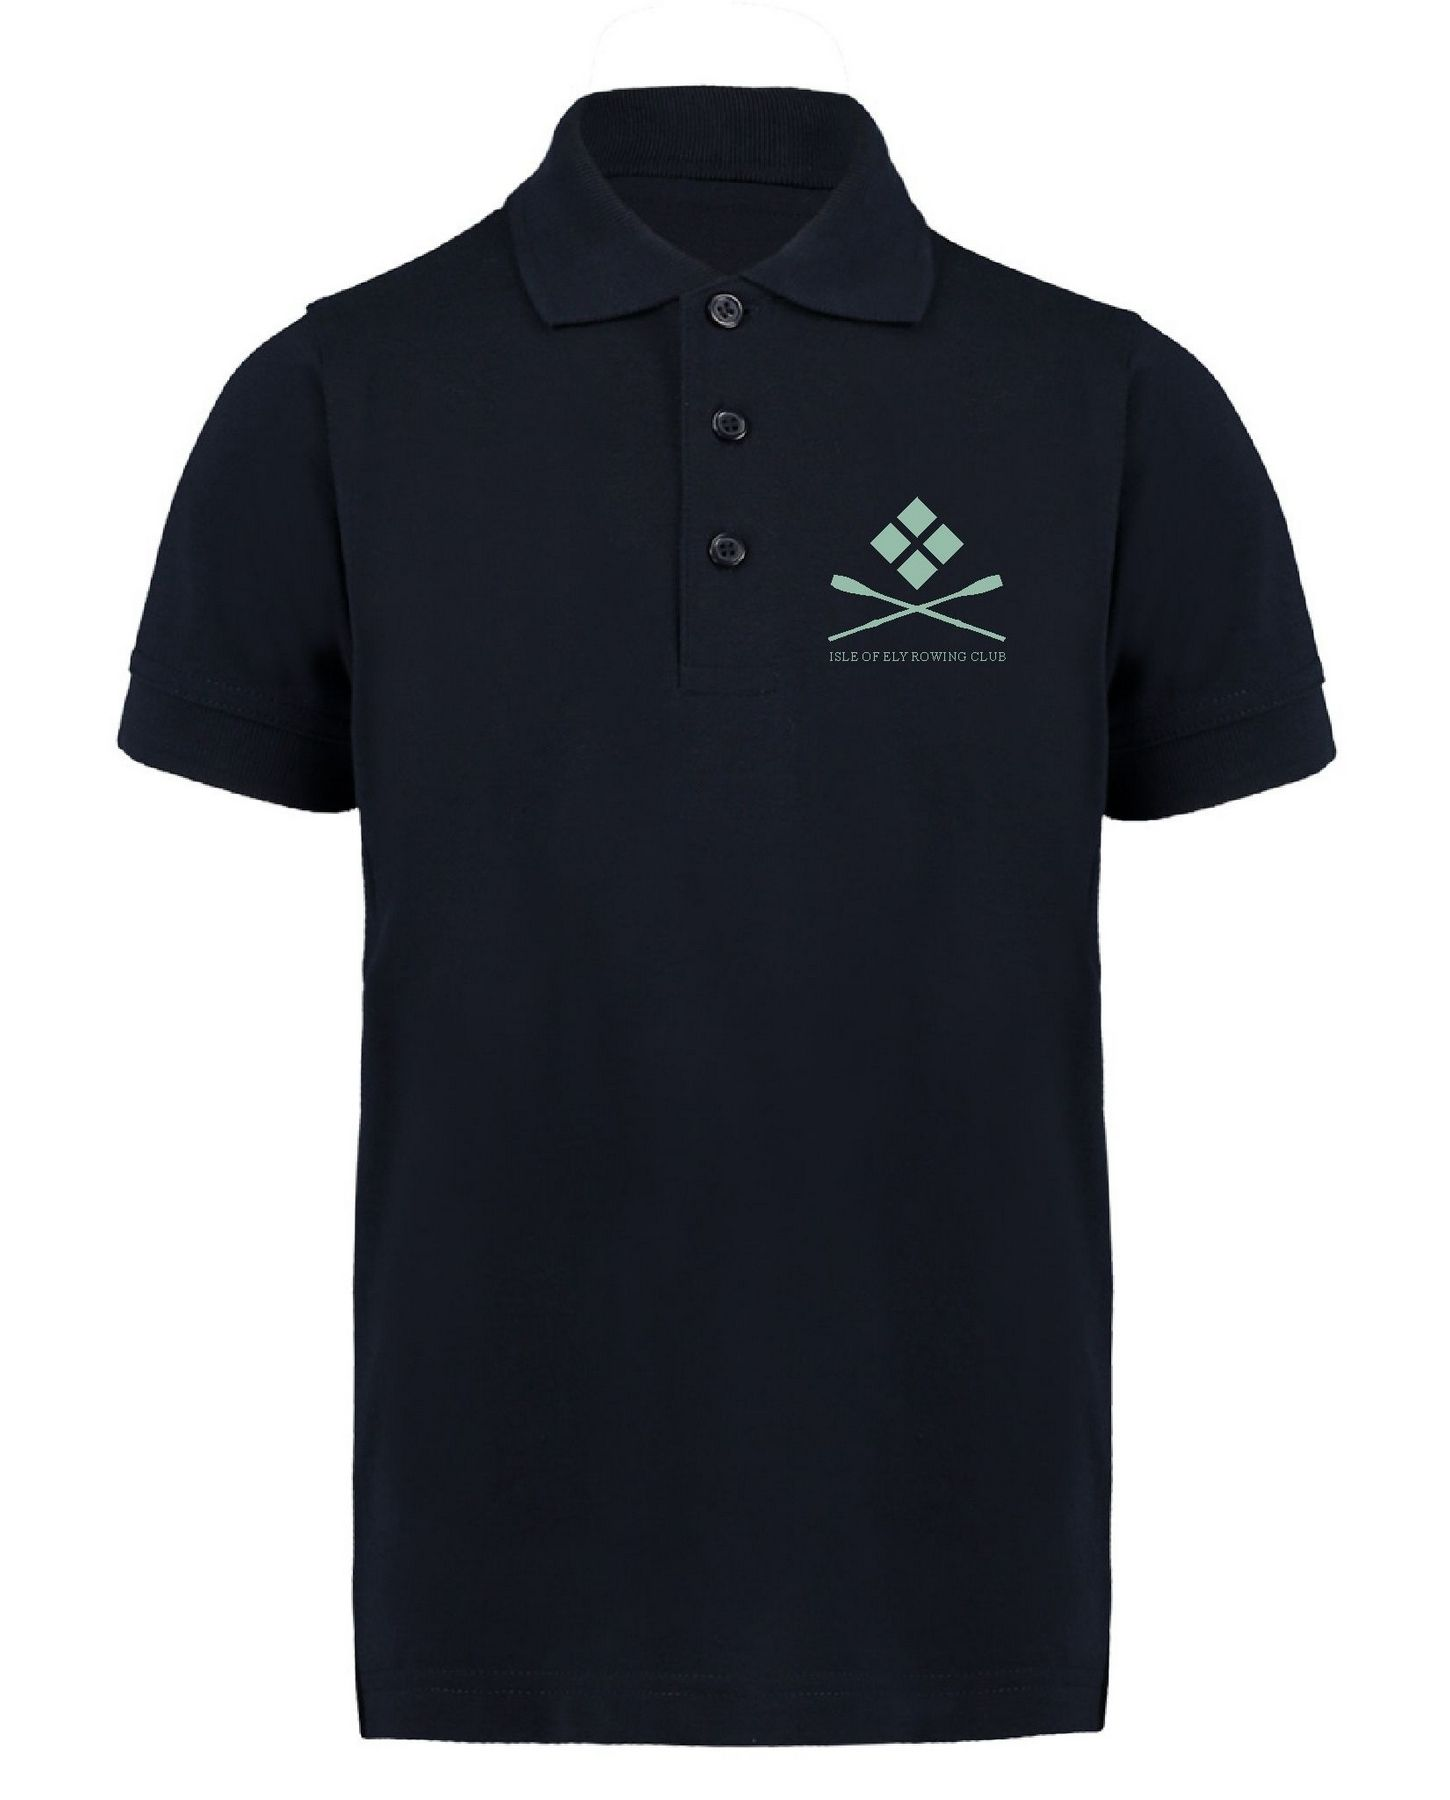 IOERC – Polo Shirt (Kids)